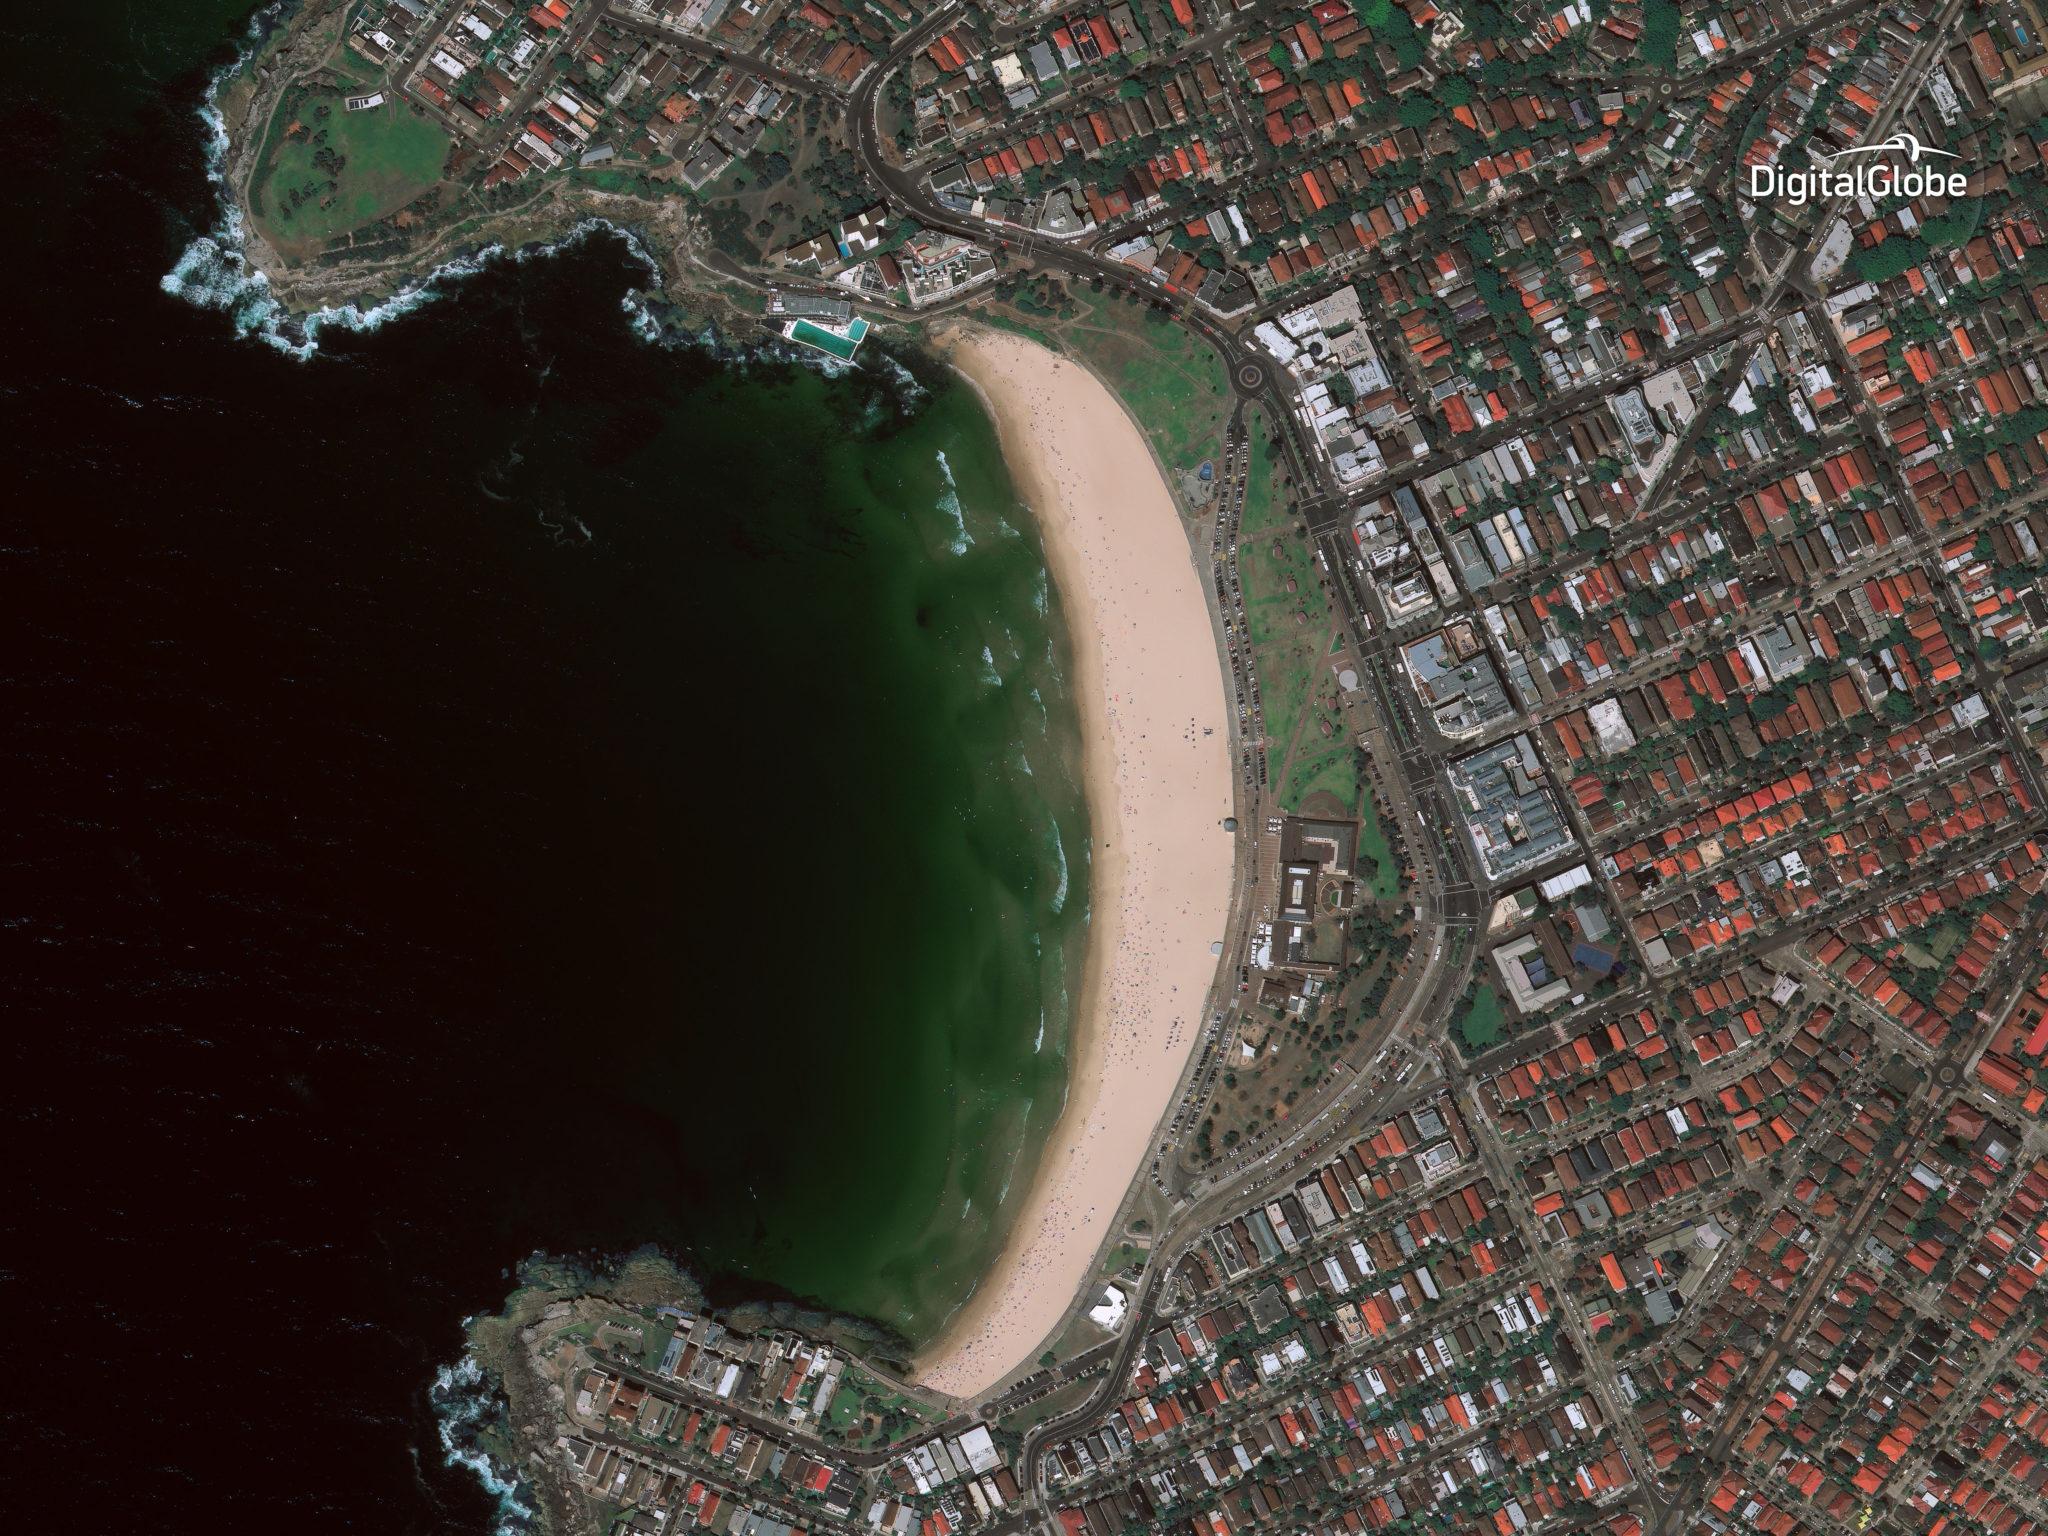 Sydney captured by the WorldView-4 satellite on Jan. 8, 2017. Photo: DigitalGlobe